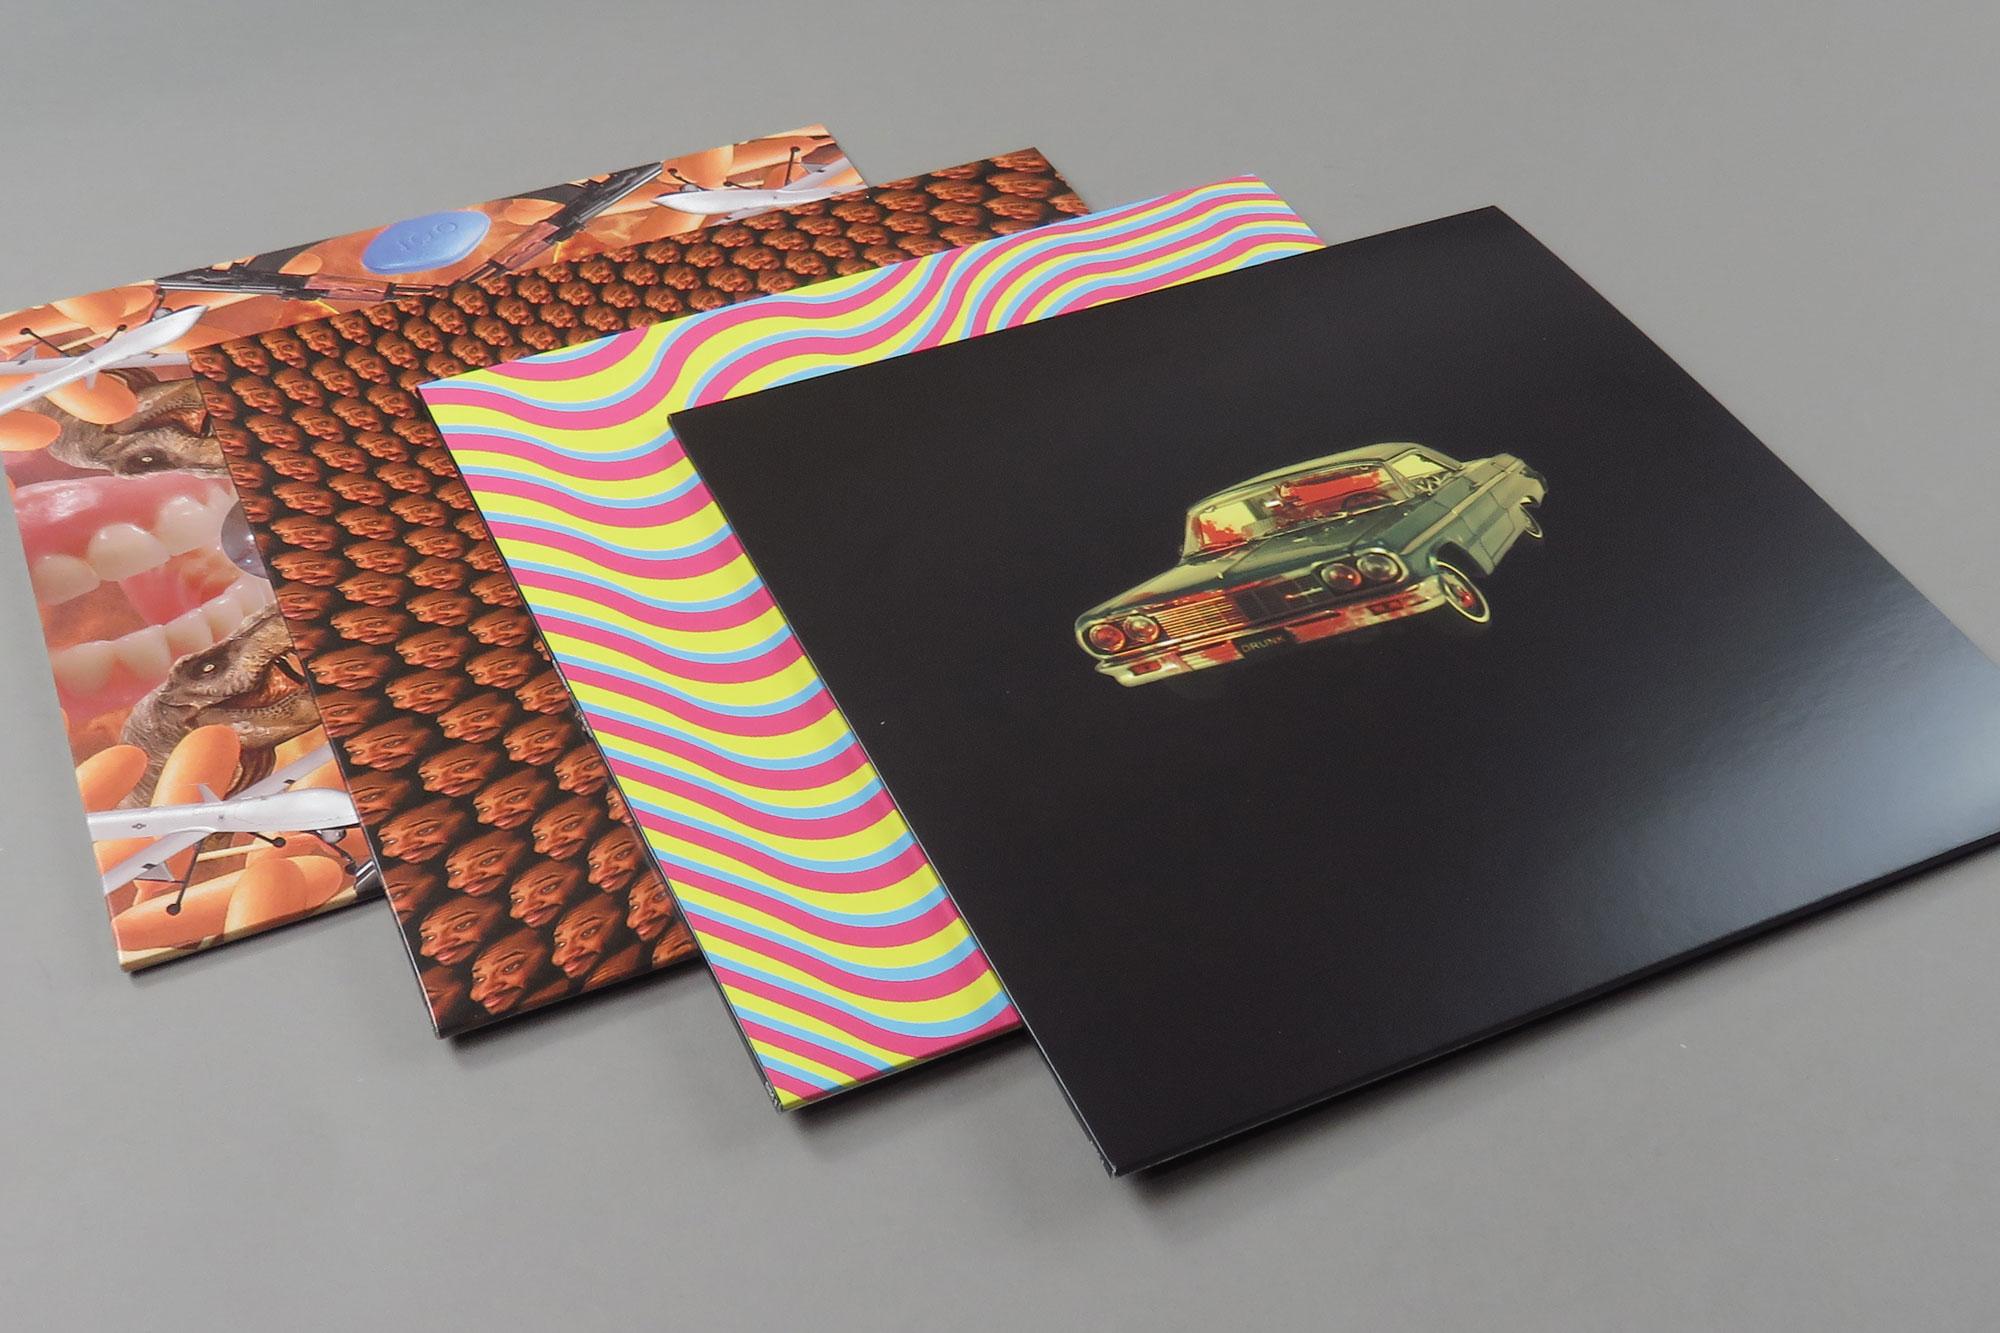 Inner sleeves for the deluxe box set designed by Zack Fox